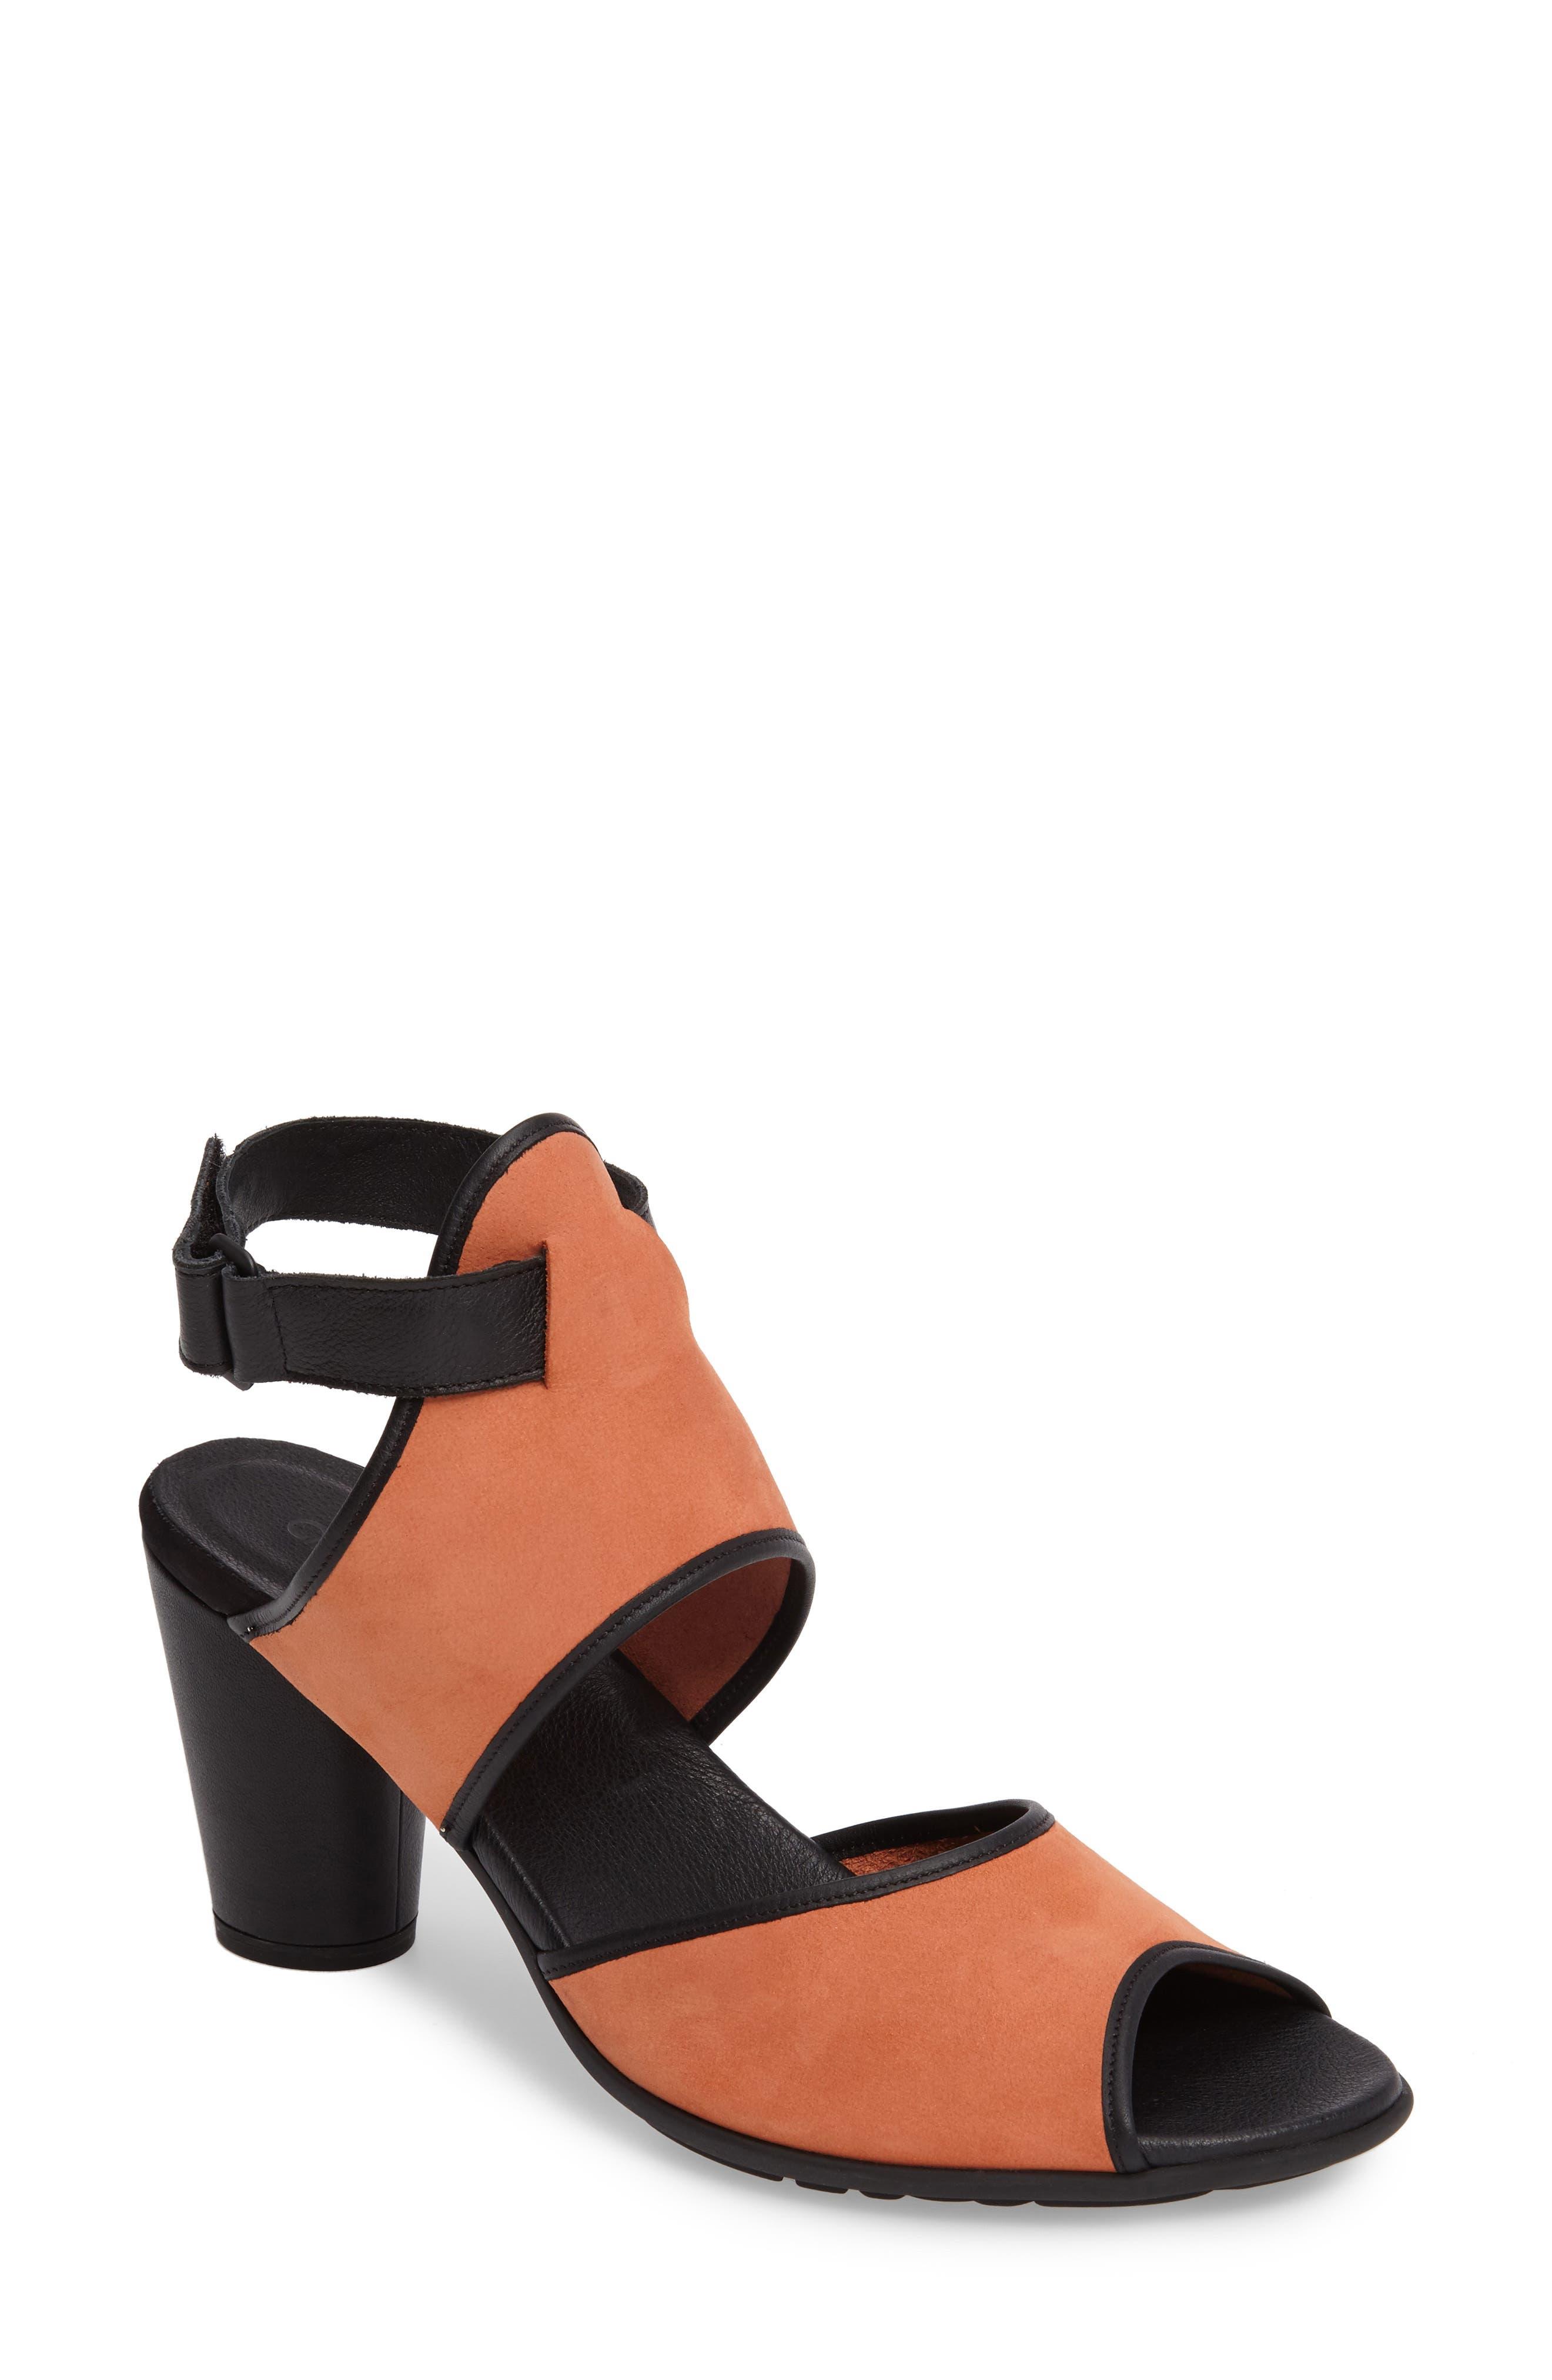 Leiga Sandal,                             Main thumbnail 1, color,                             Morgane Nubuck Leather